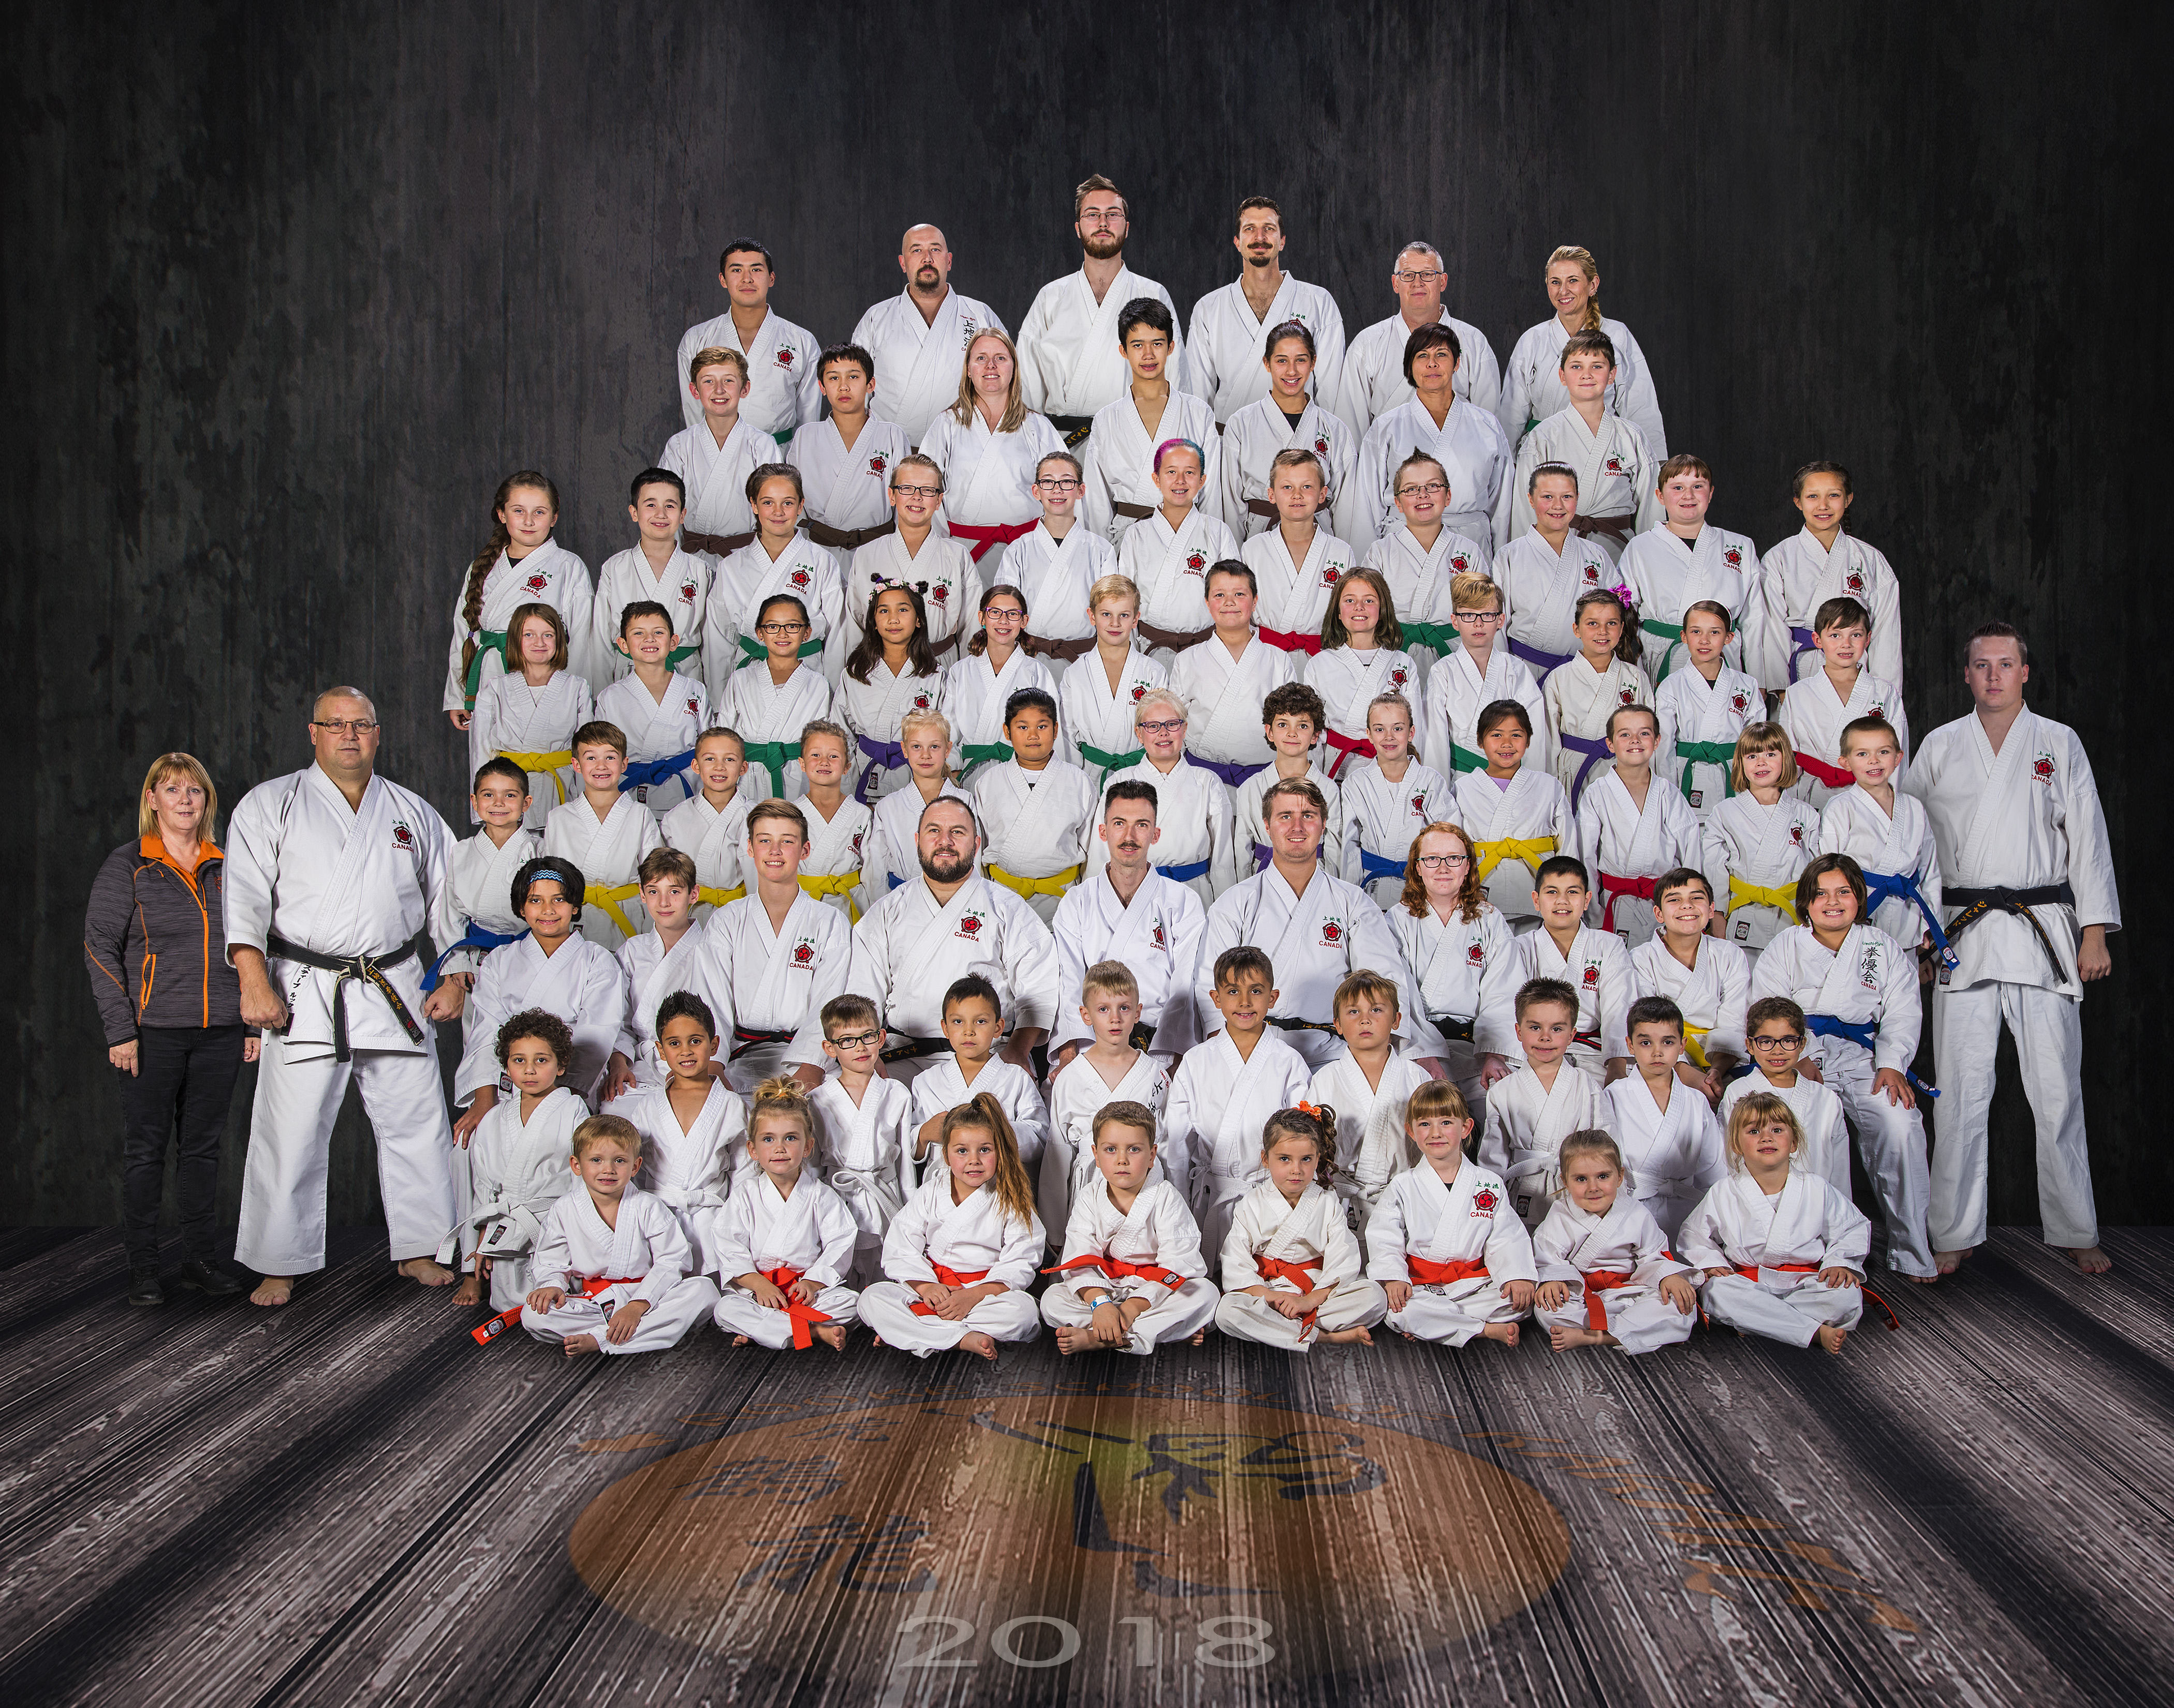 http://rookekarate.com/wp-content/uploads/2019/03/Rooke-Karate2018.jpg